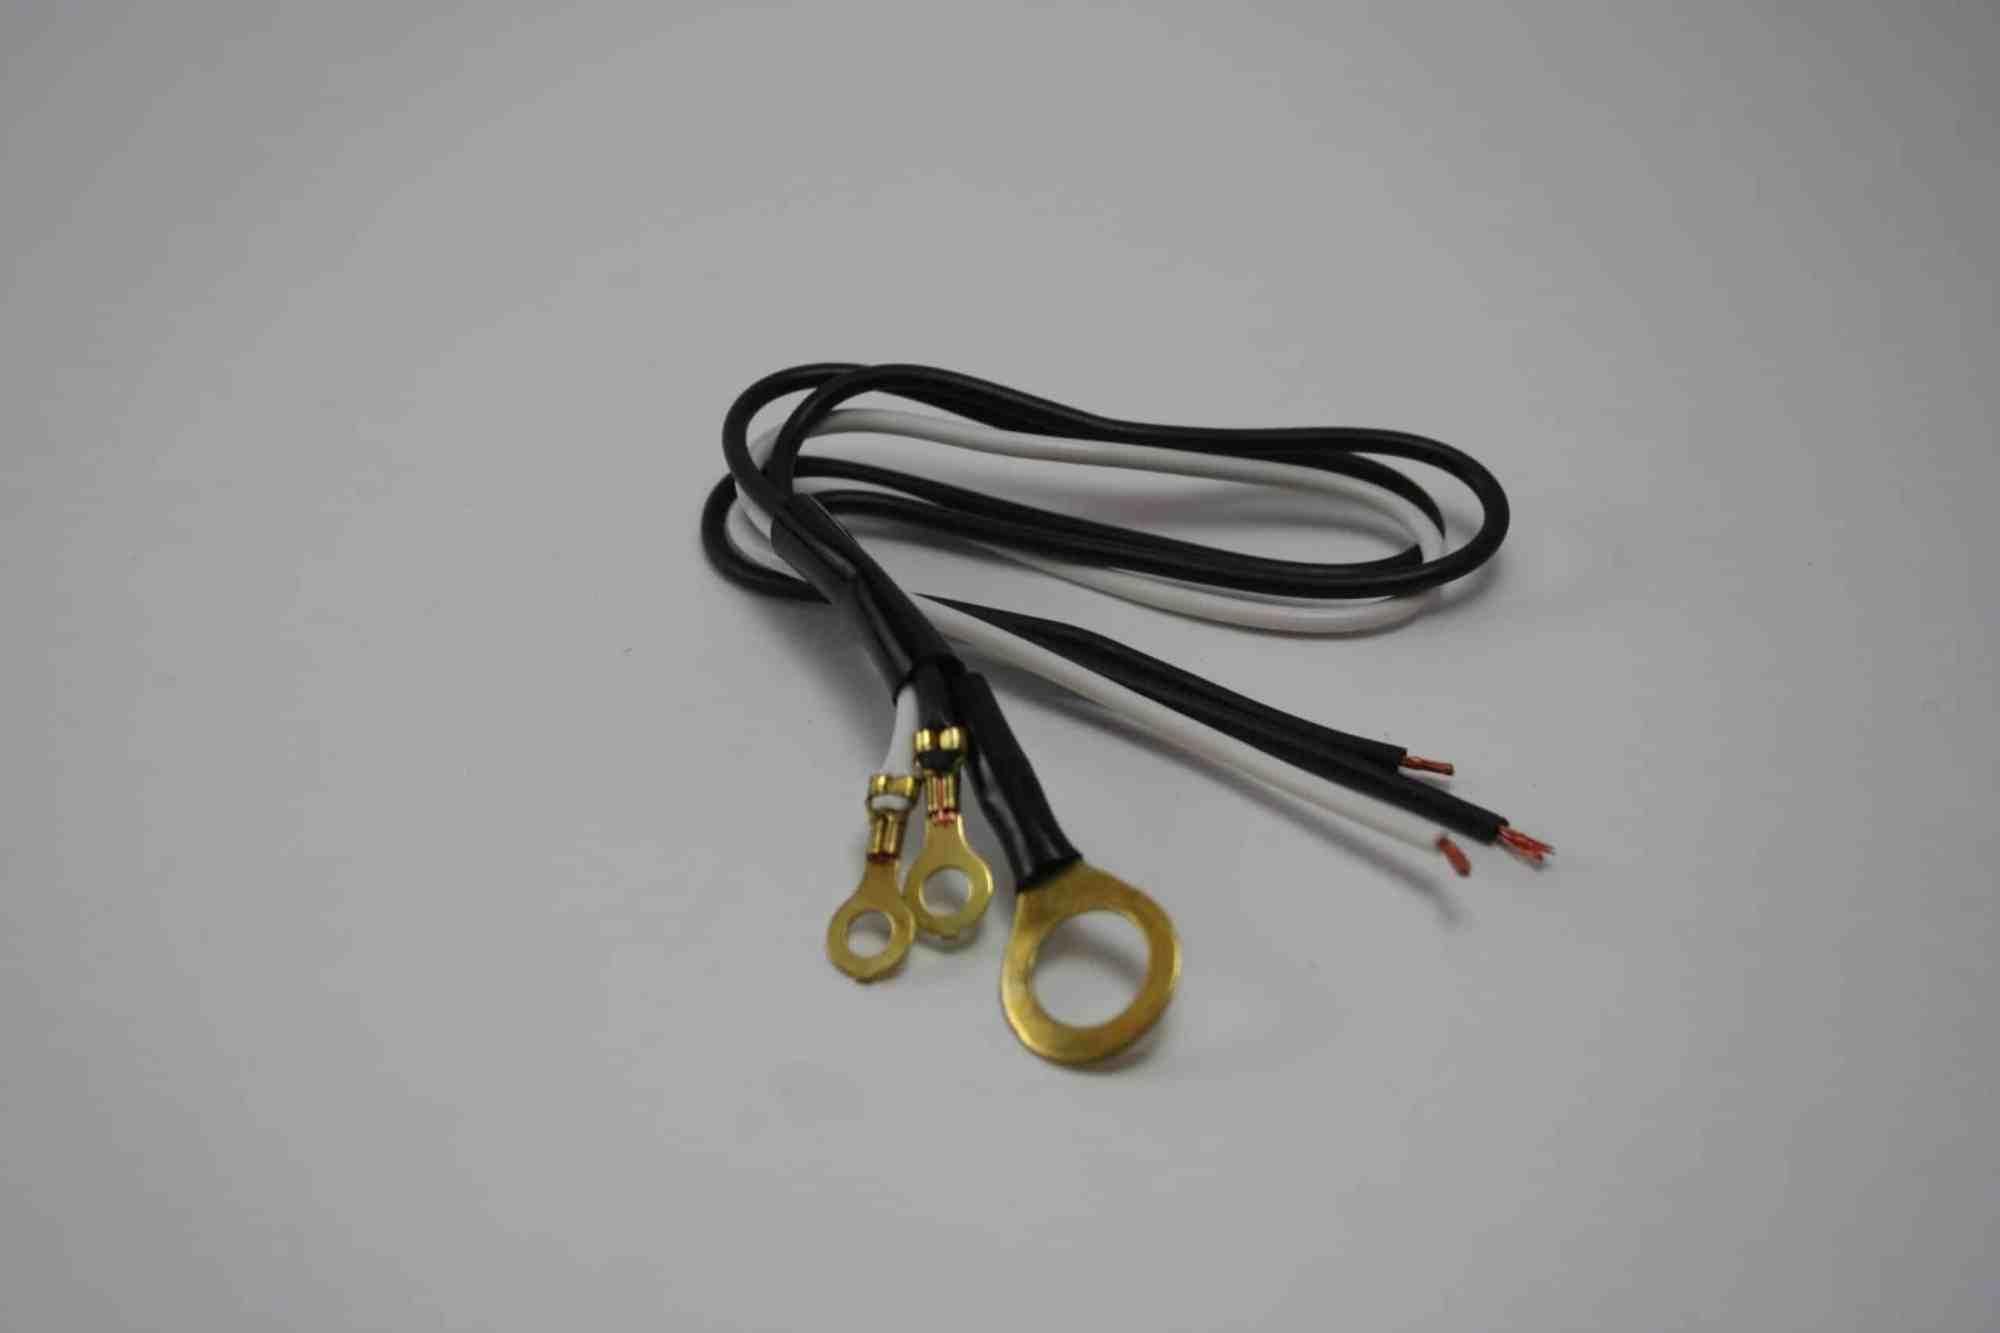 hight resolution of 28861 ford and vw alternator wiring harness j mak industries vw alternator wiring harness 2004